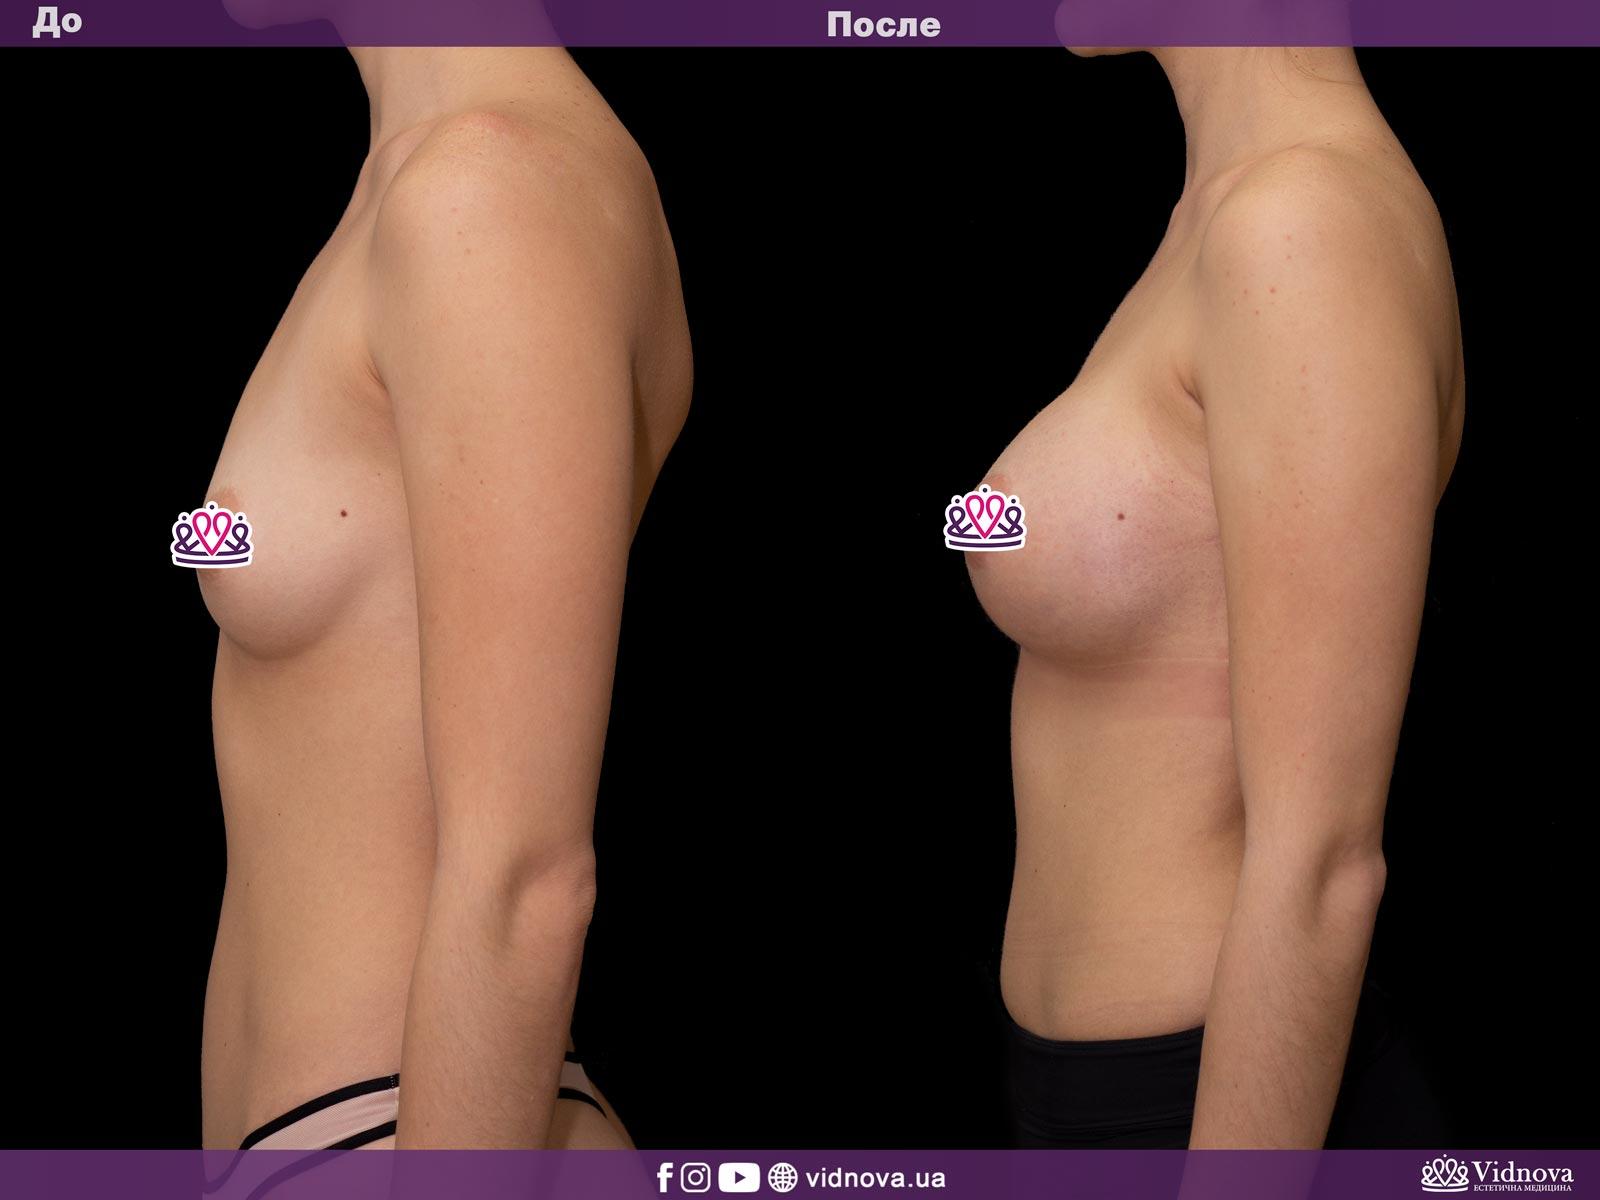 Увеличение груди: Фото ДО и ПОСЛЕ - Пример №31-3 - Клиника Vidnova